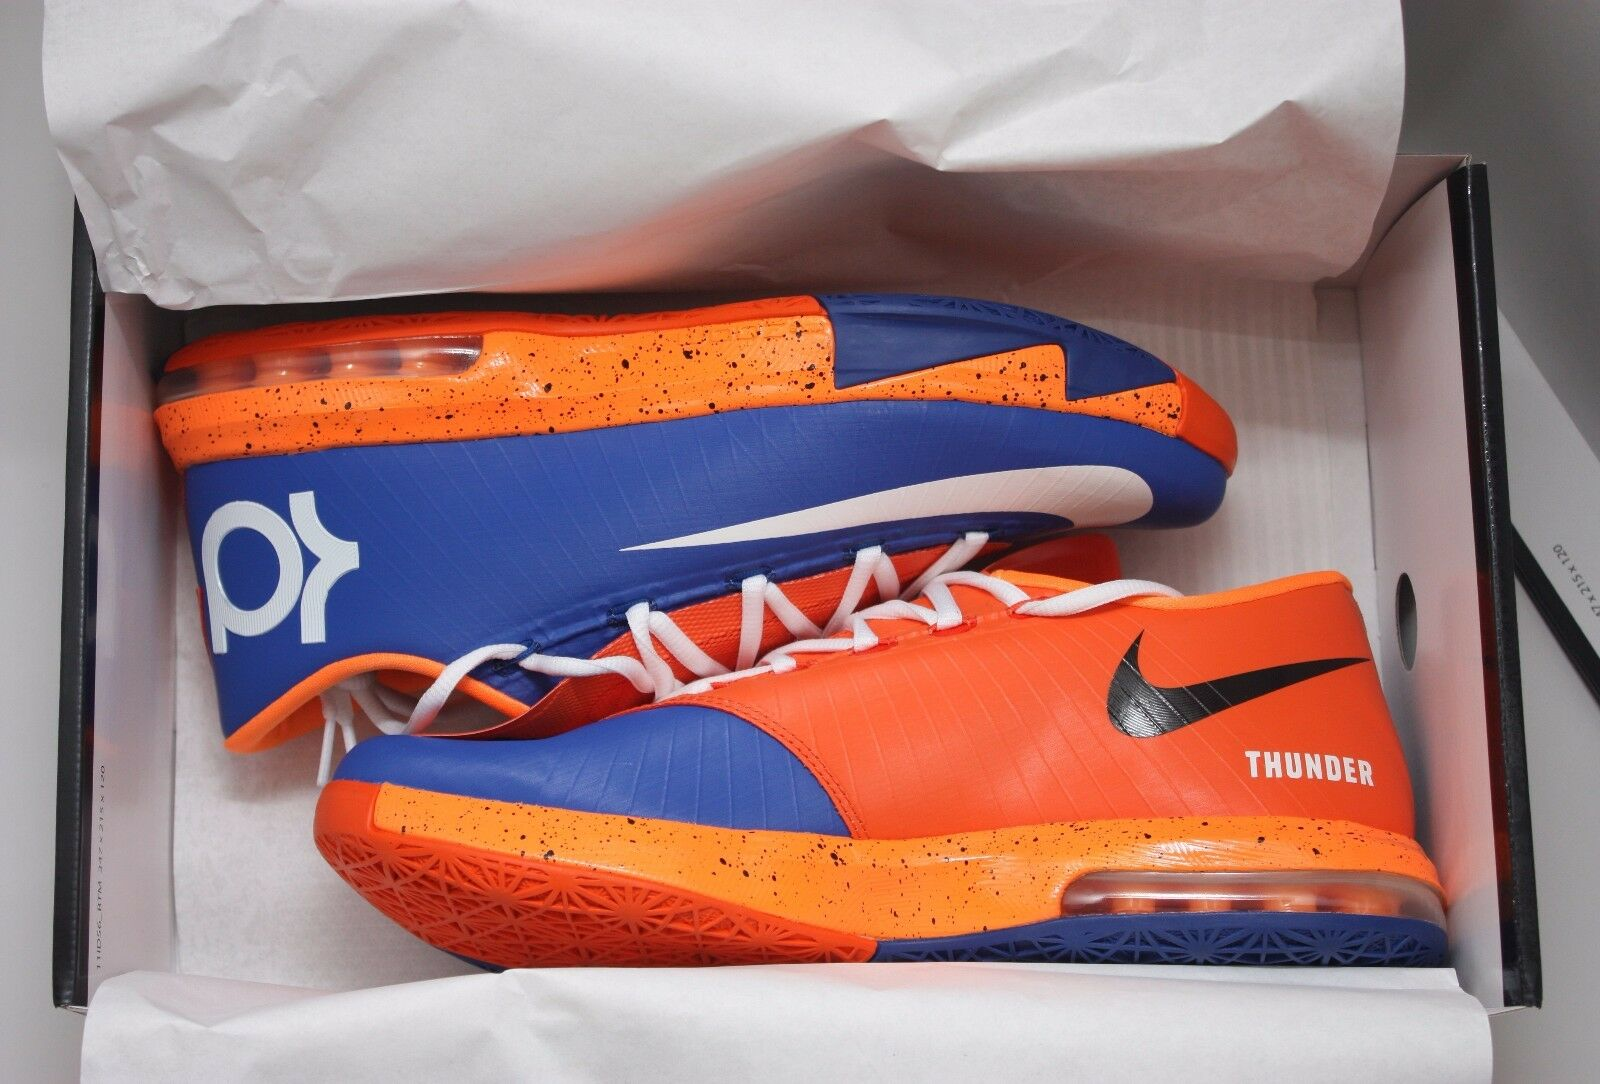 Nike kd vi 6 43 - thunder city arancio - blu white-n7-ext gomma - 627954 991